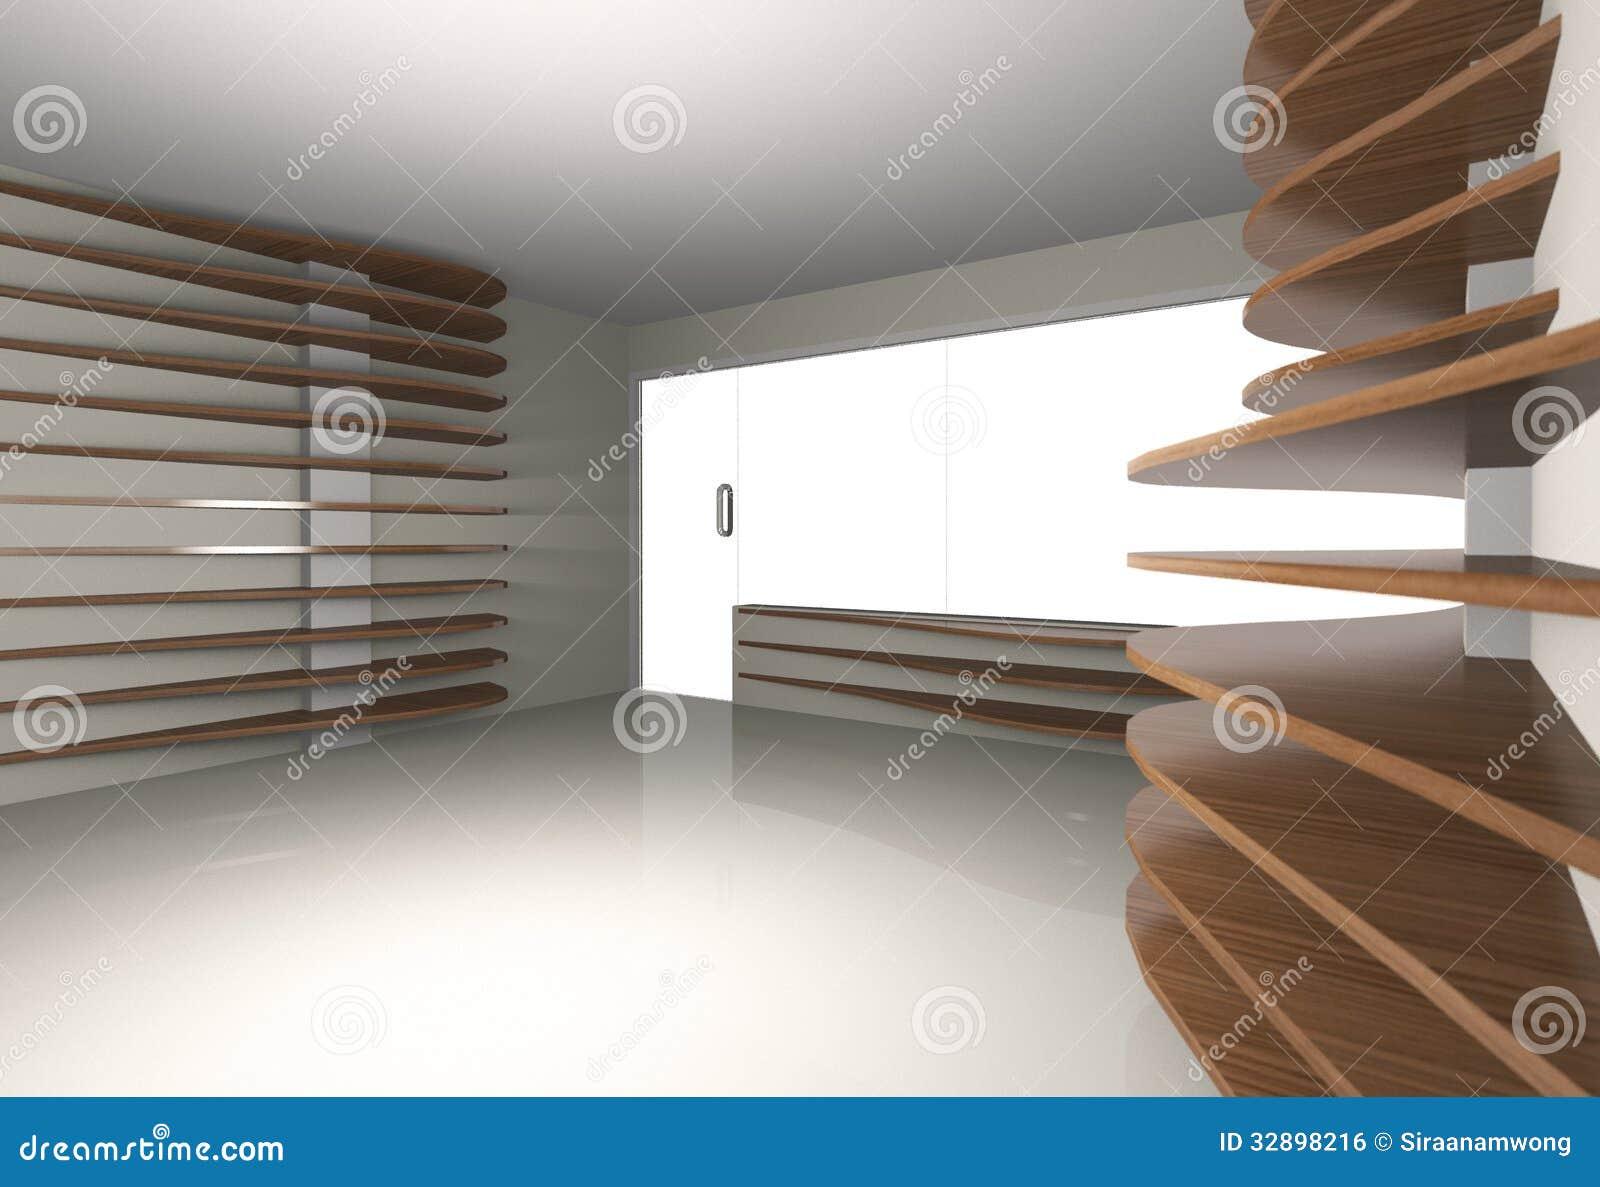 Abstract Interior With Horizontal Wood Shelfs Stock ...